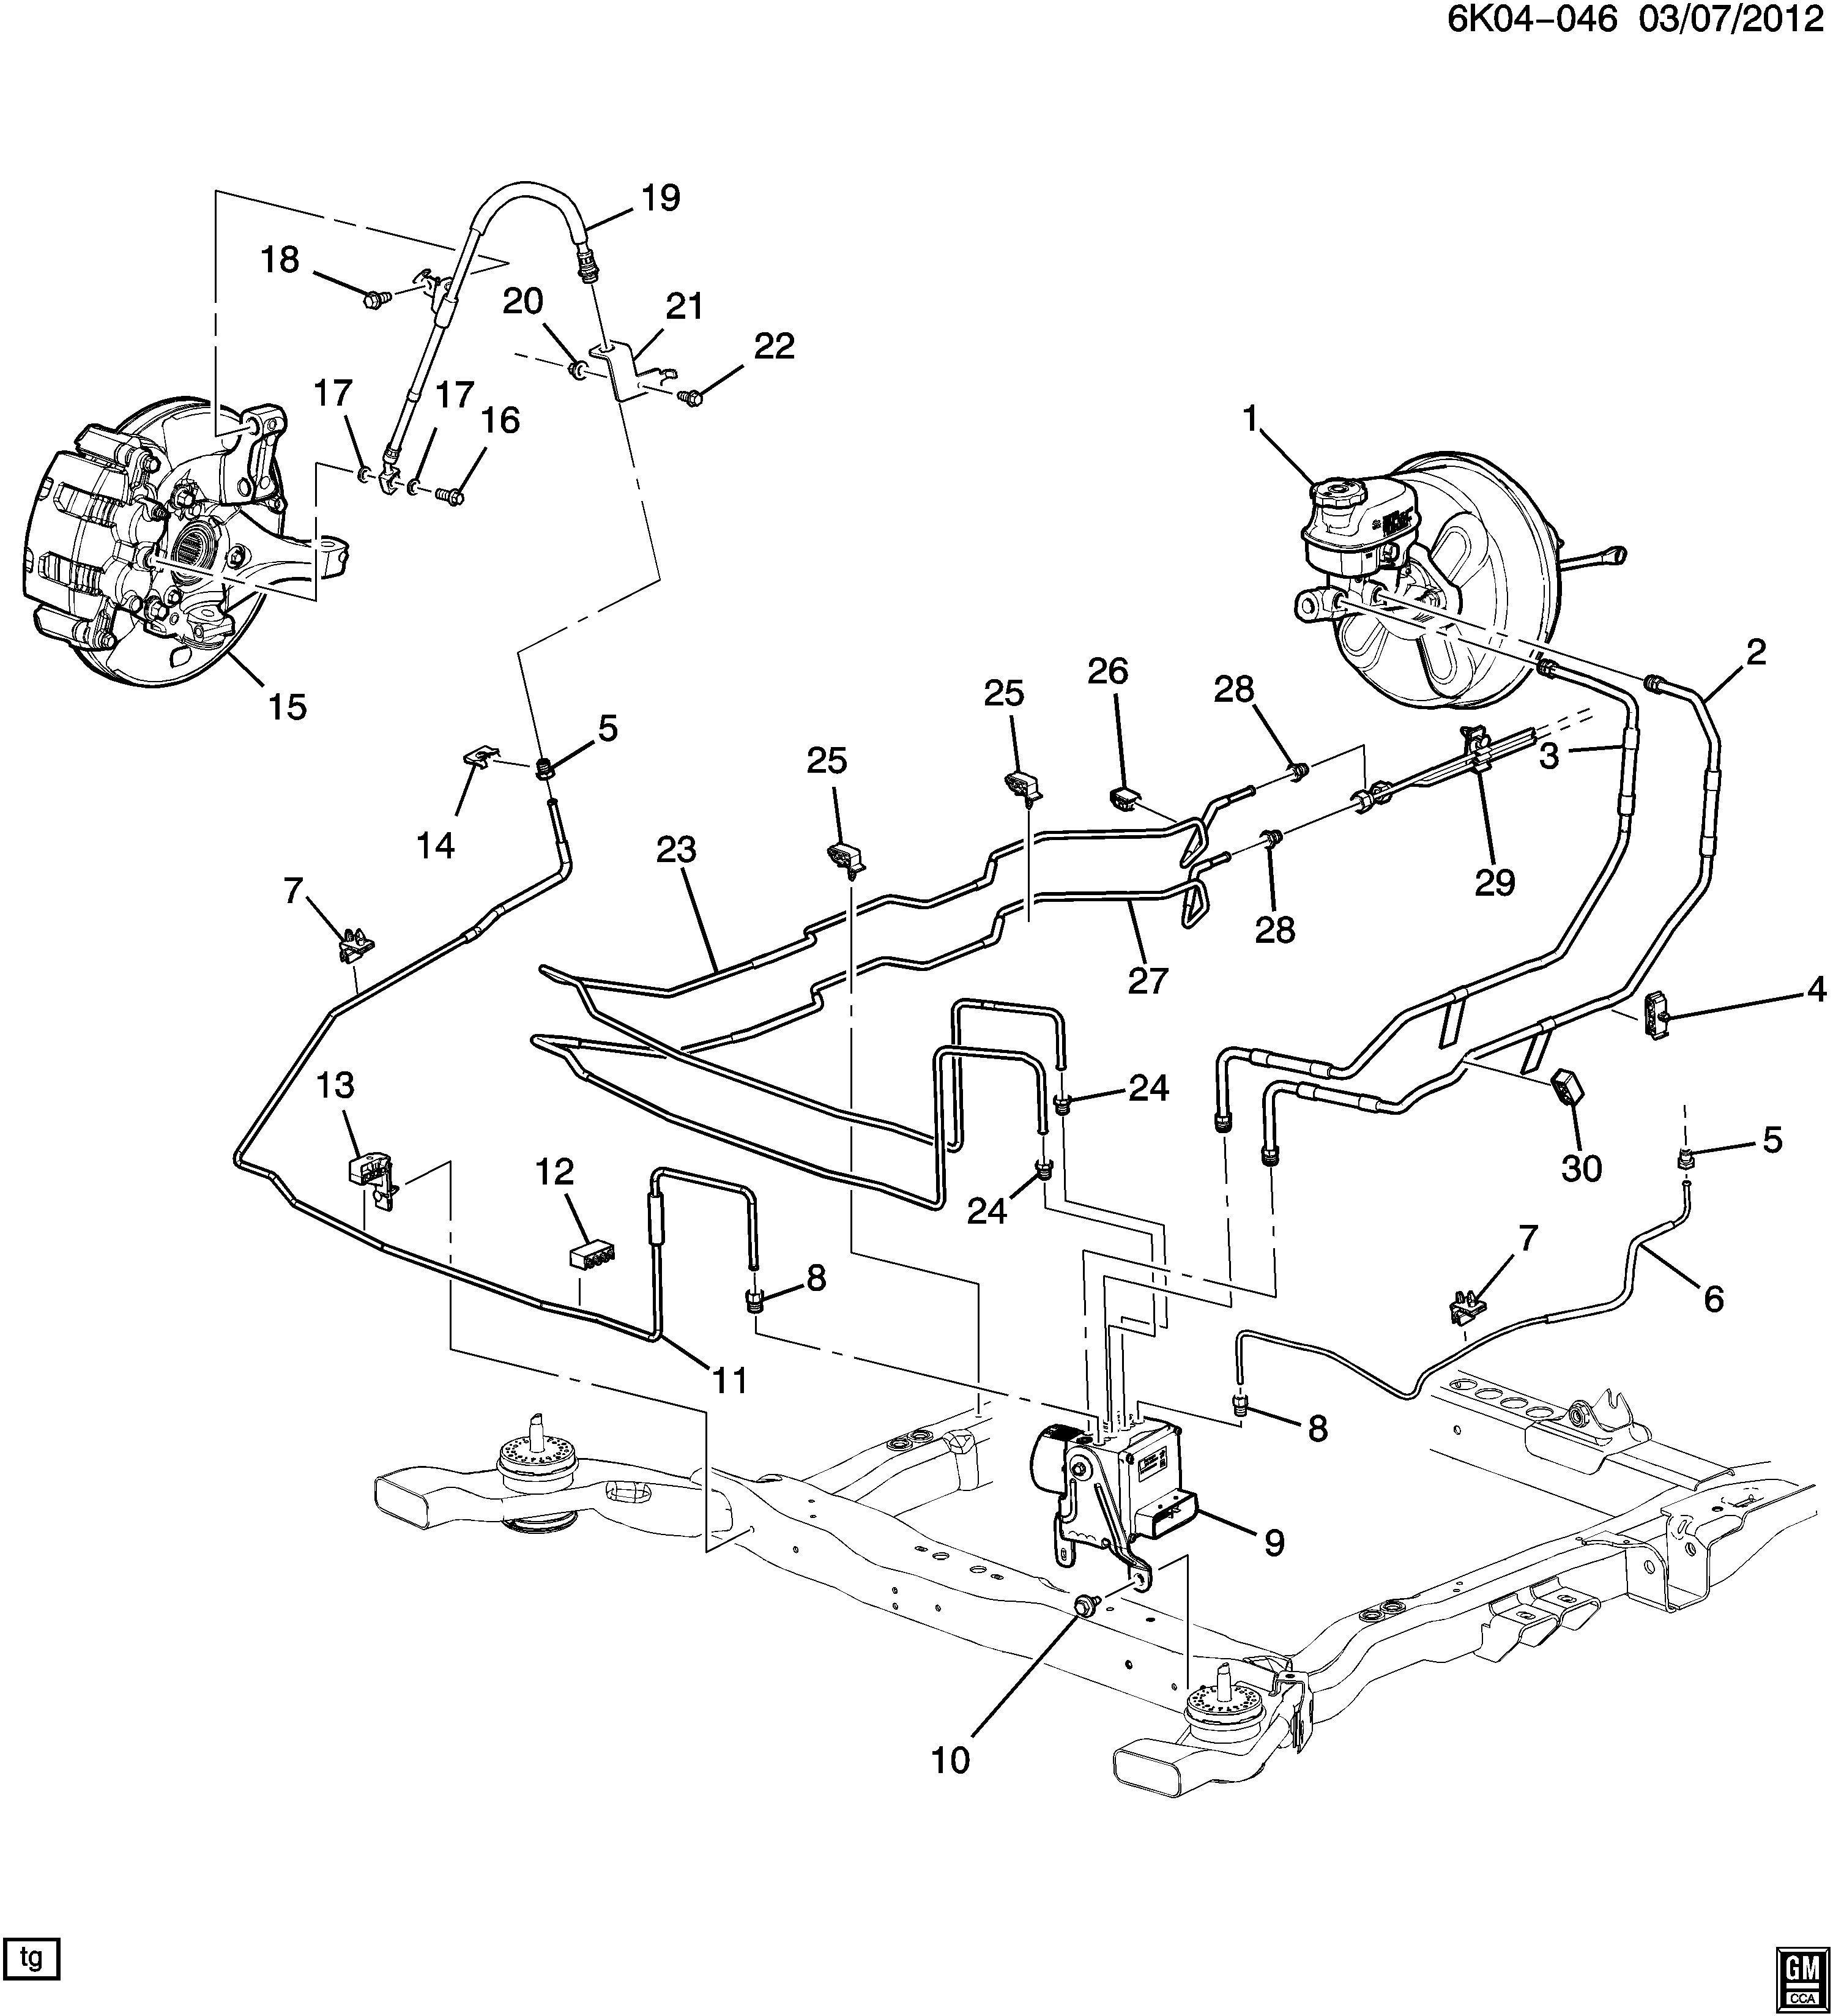 Buick Lucerne Pipe. Hydraulic brake. Pipe, brk press mod